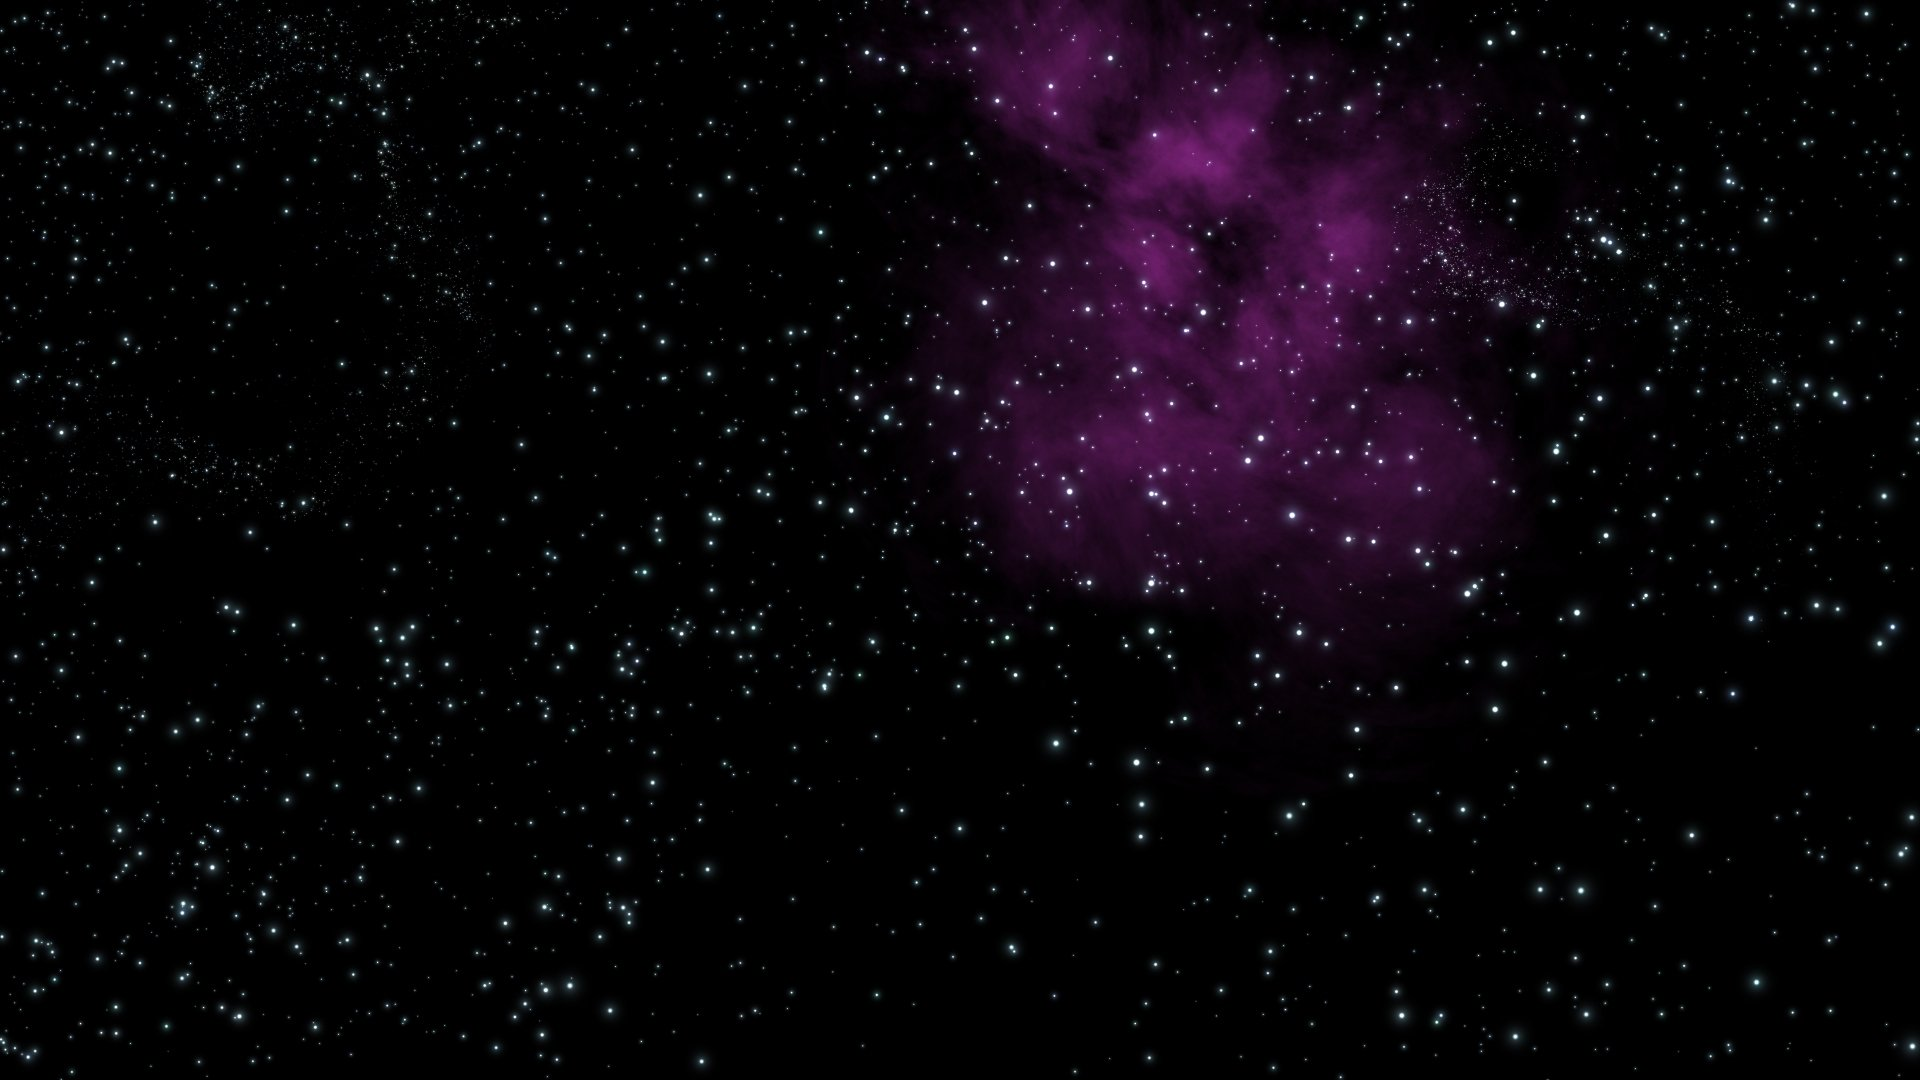 Tumblr Backgrounds Galaxy Galaxy Wallpaper Tumblr Hd Wallpapers